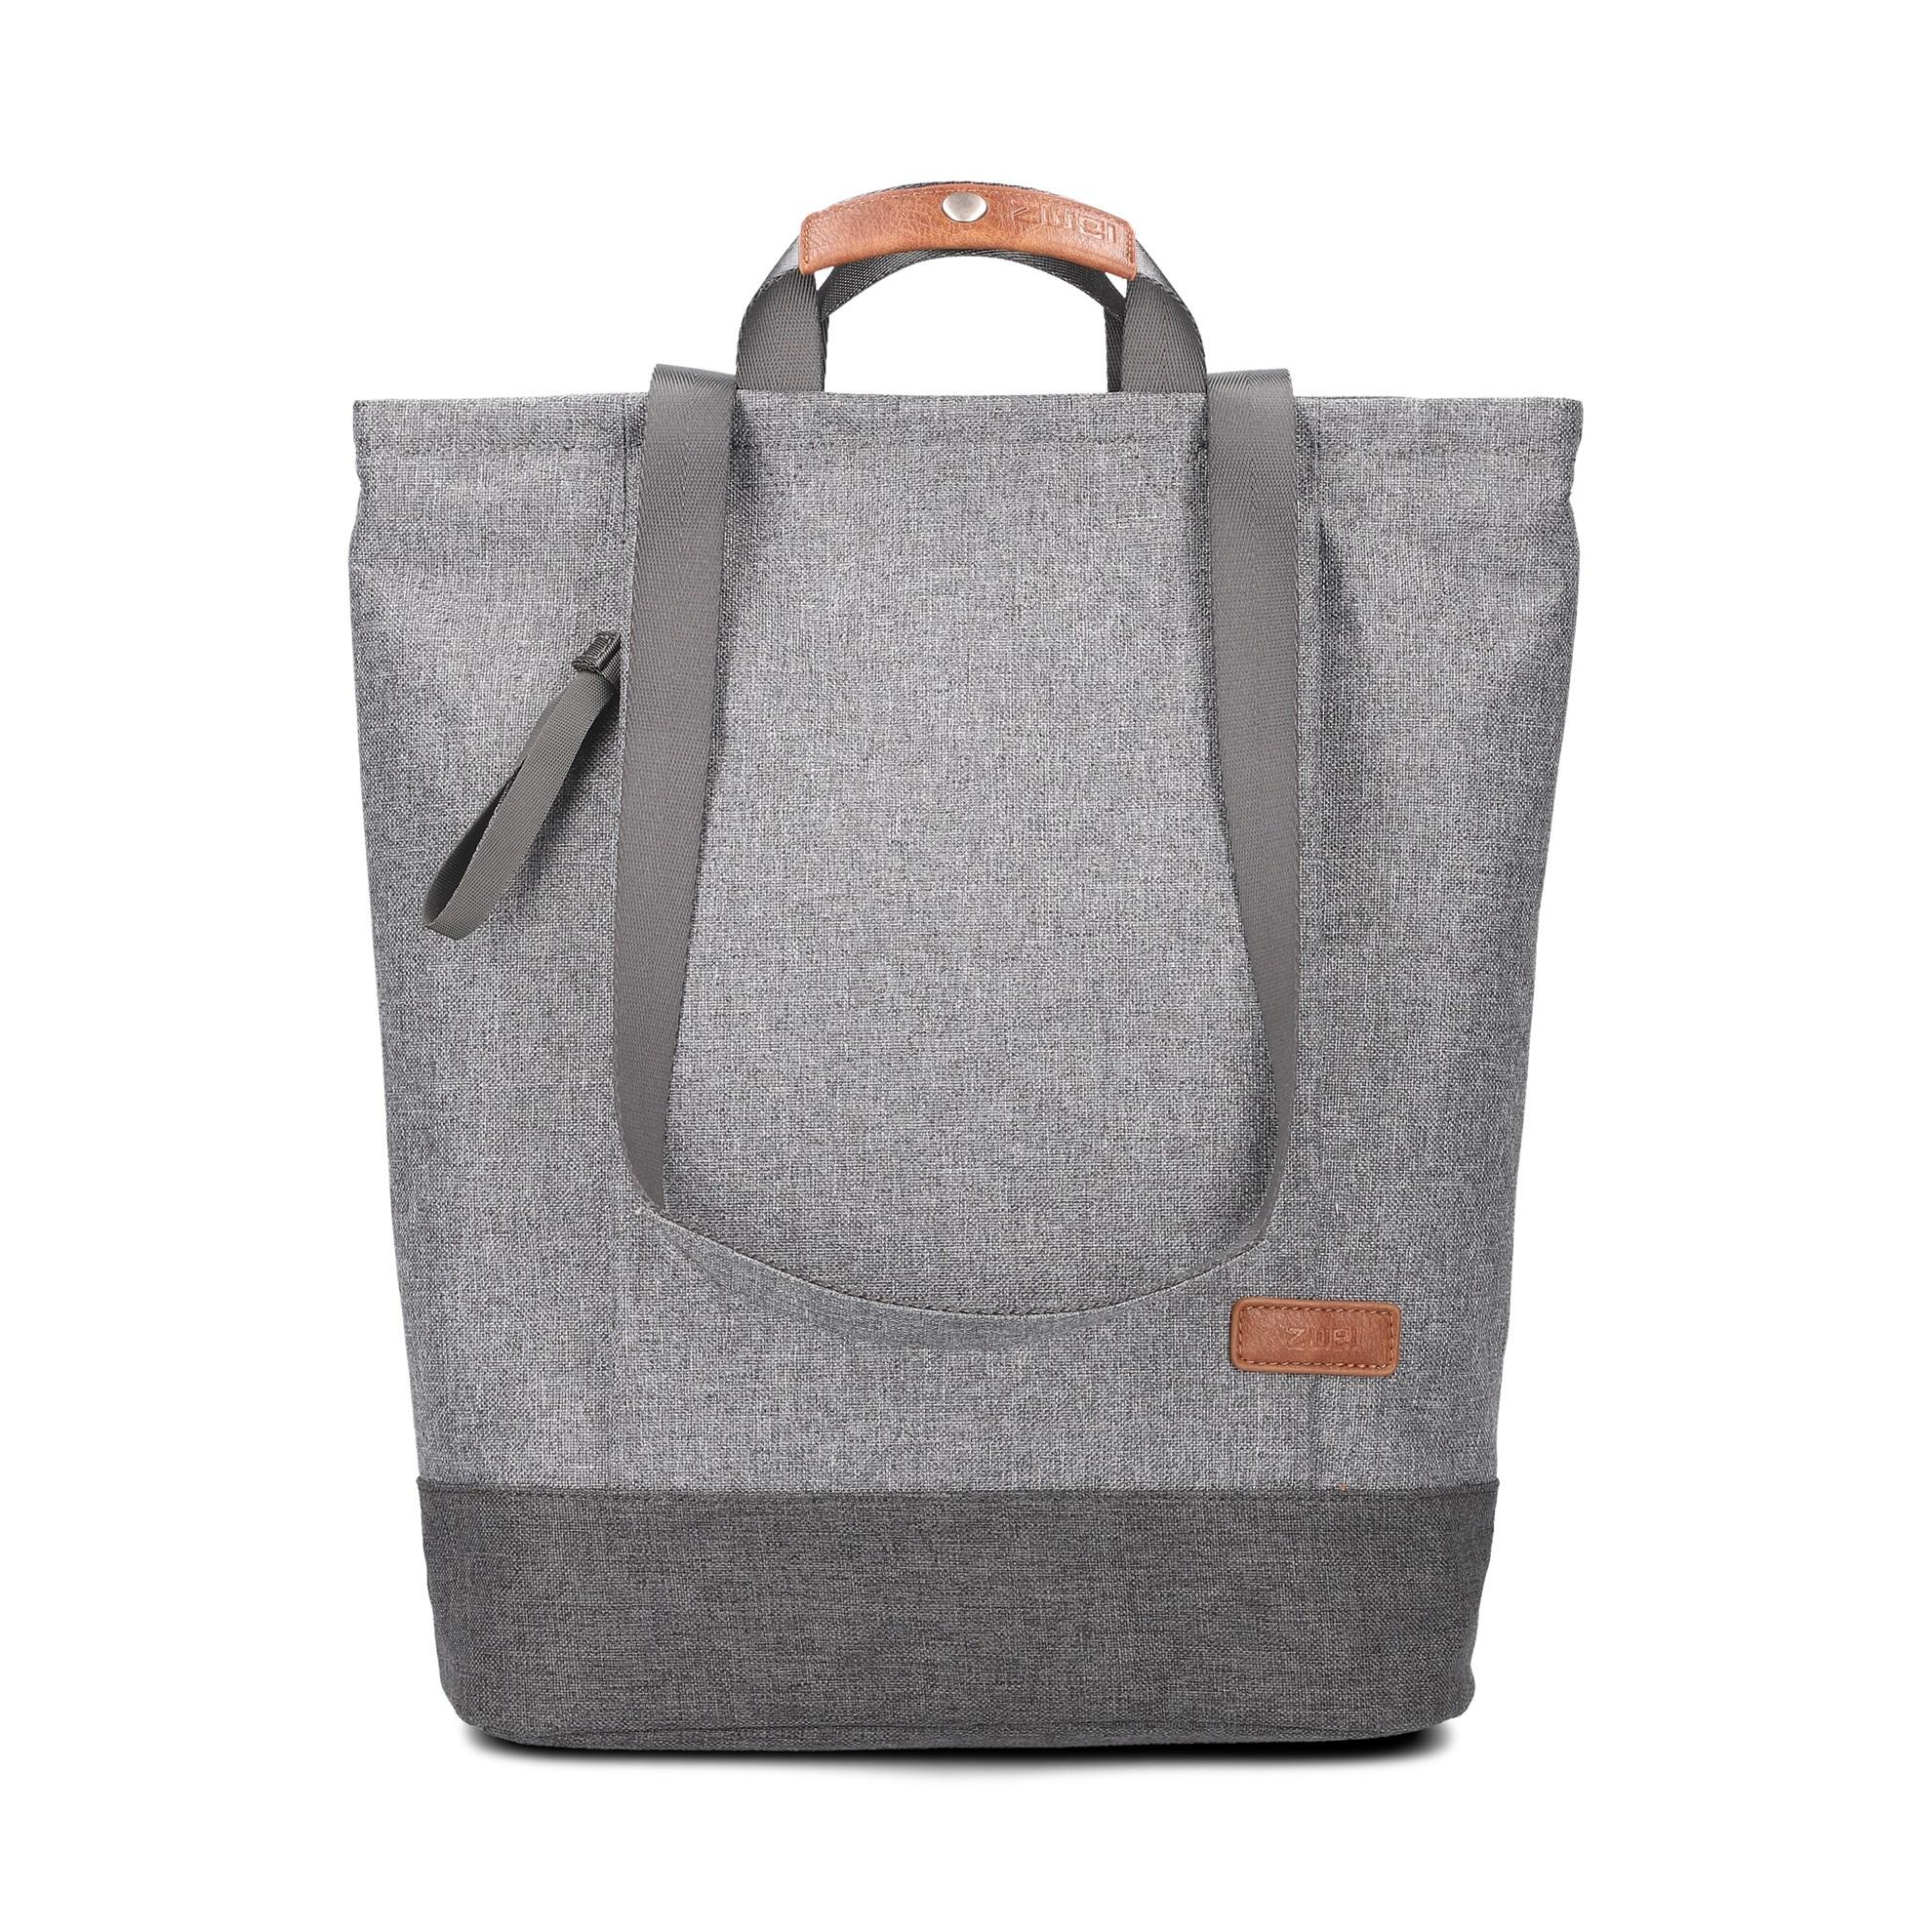 Batoh/taška přes rameno ZWEI BENNO BE140_0